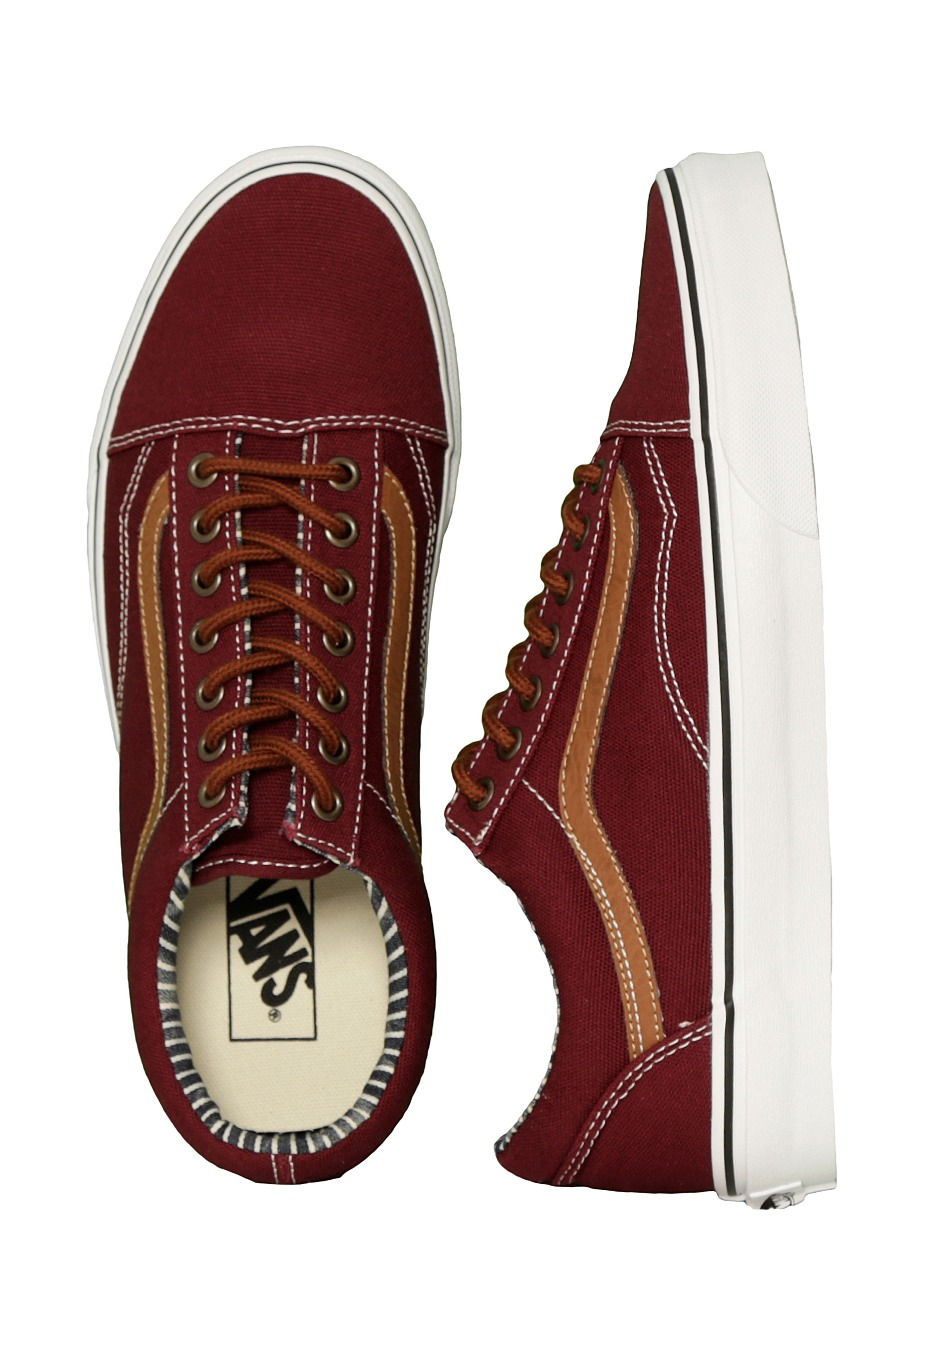 9bb8d6732f Vans - Old Skool C L Port Royale Stripe Denim - Shoes - Impericon.com UK